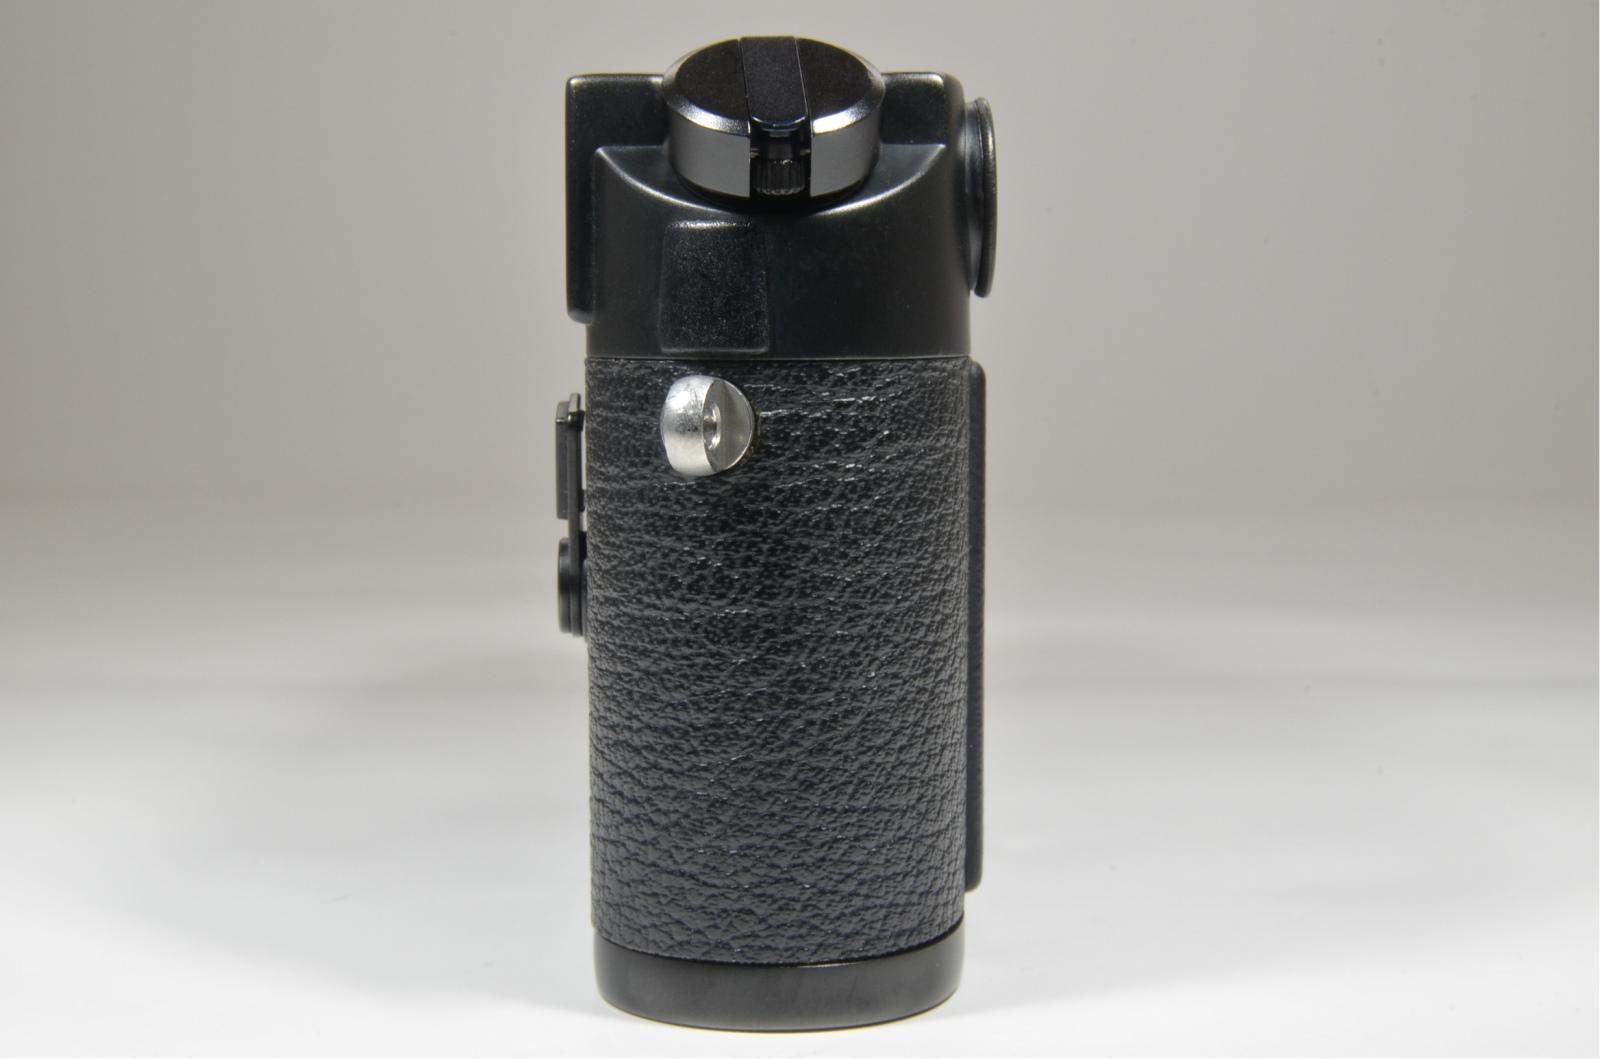 leica m6 0.72 black rangefinder serial no.1785965 year 1990 with case